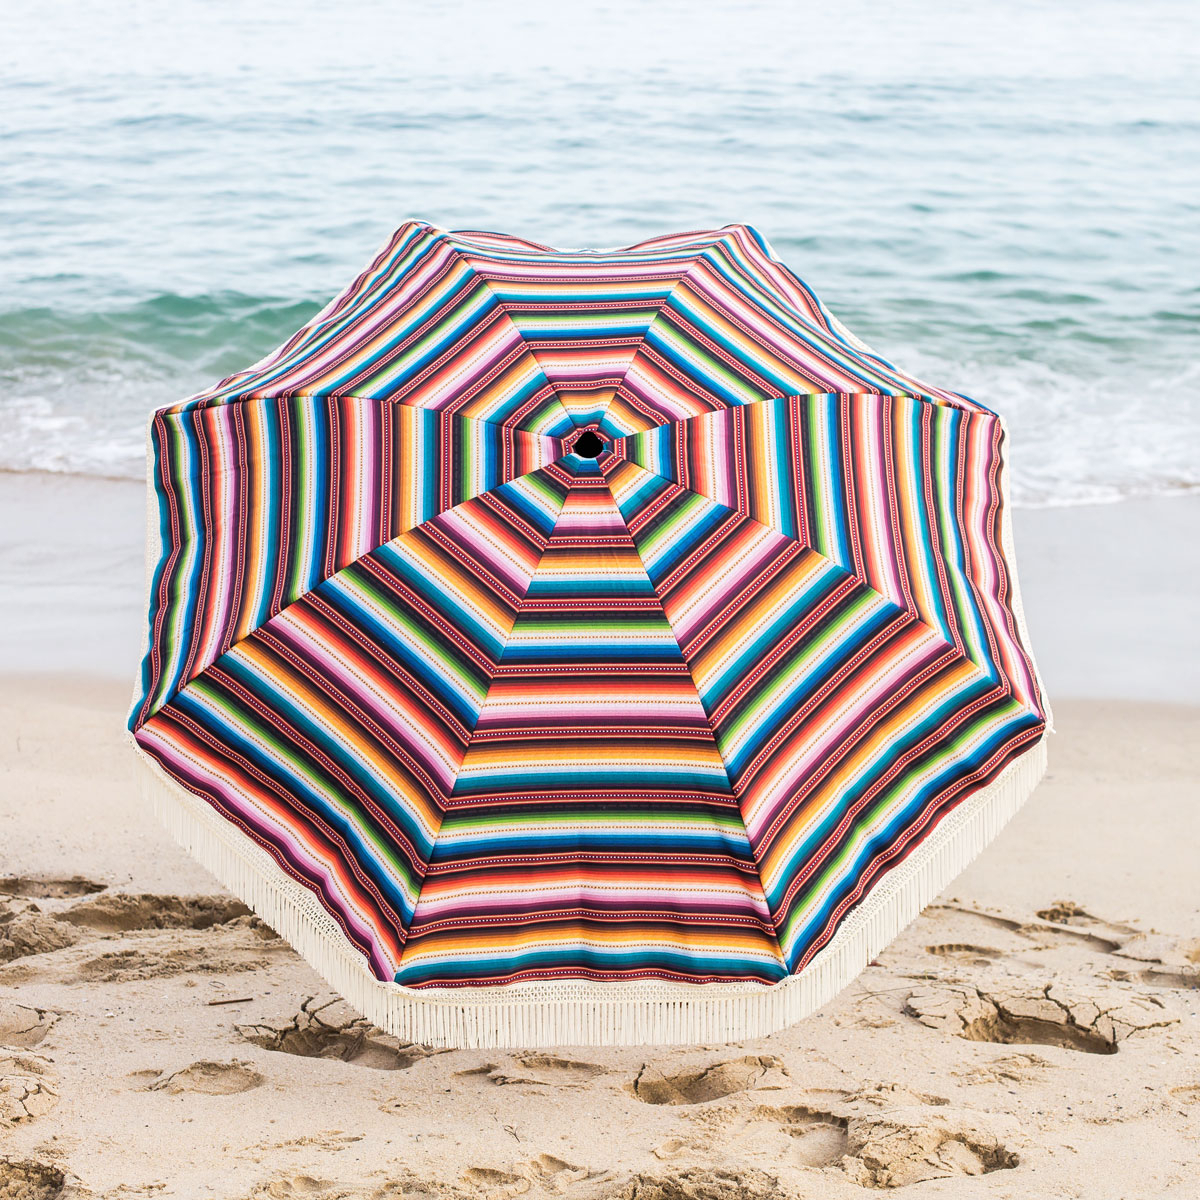 Big 5 Beach Umbrella – Caldwellcountytxoem Throughout Well Known Alyson Joeshade Beach Umbrellas (View 19 of 20)